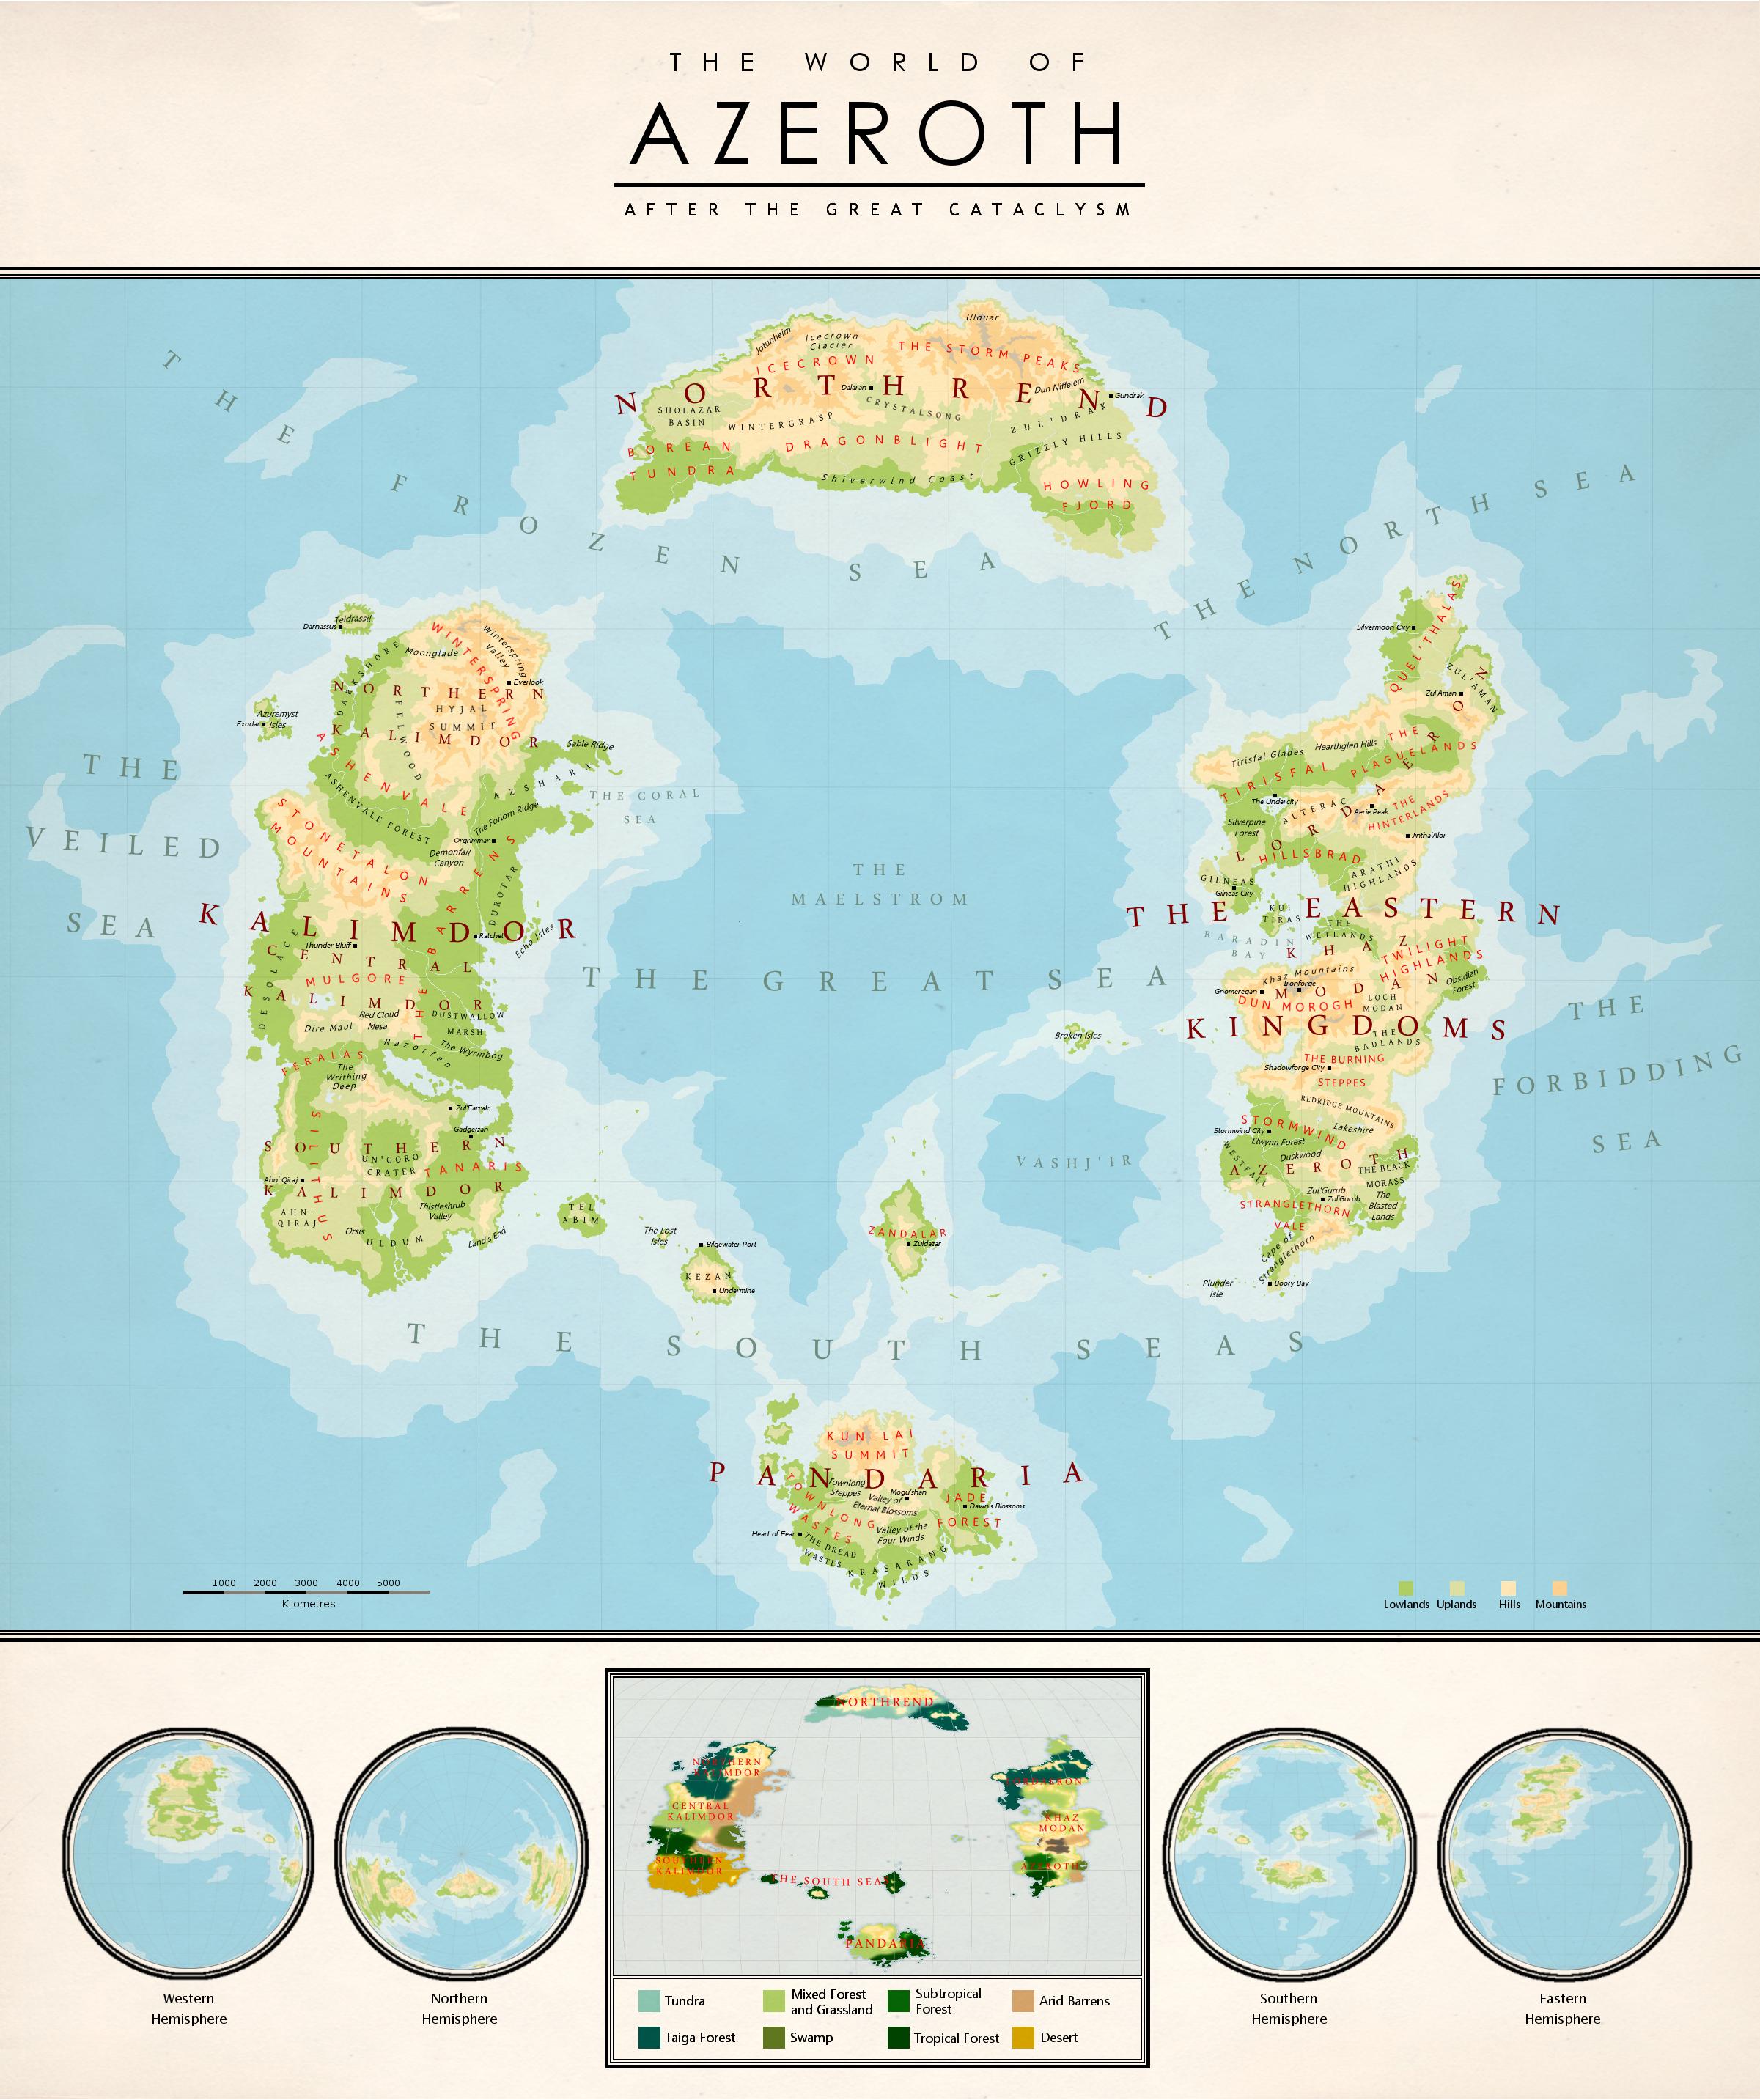 the atlantis colony by ynot1989 2066 earth by ynot1989 mashayajana by ribbontail